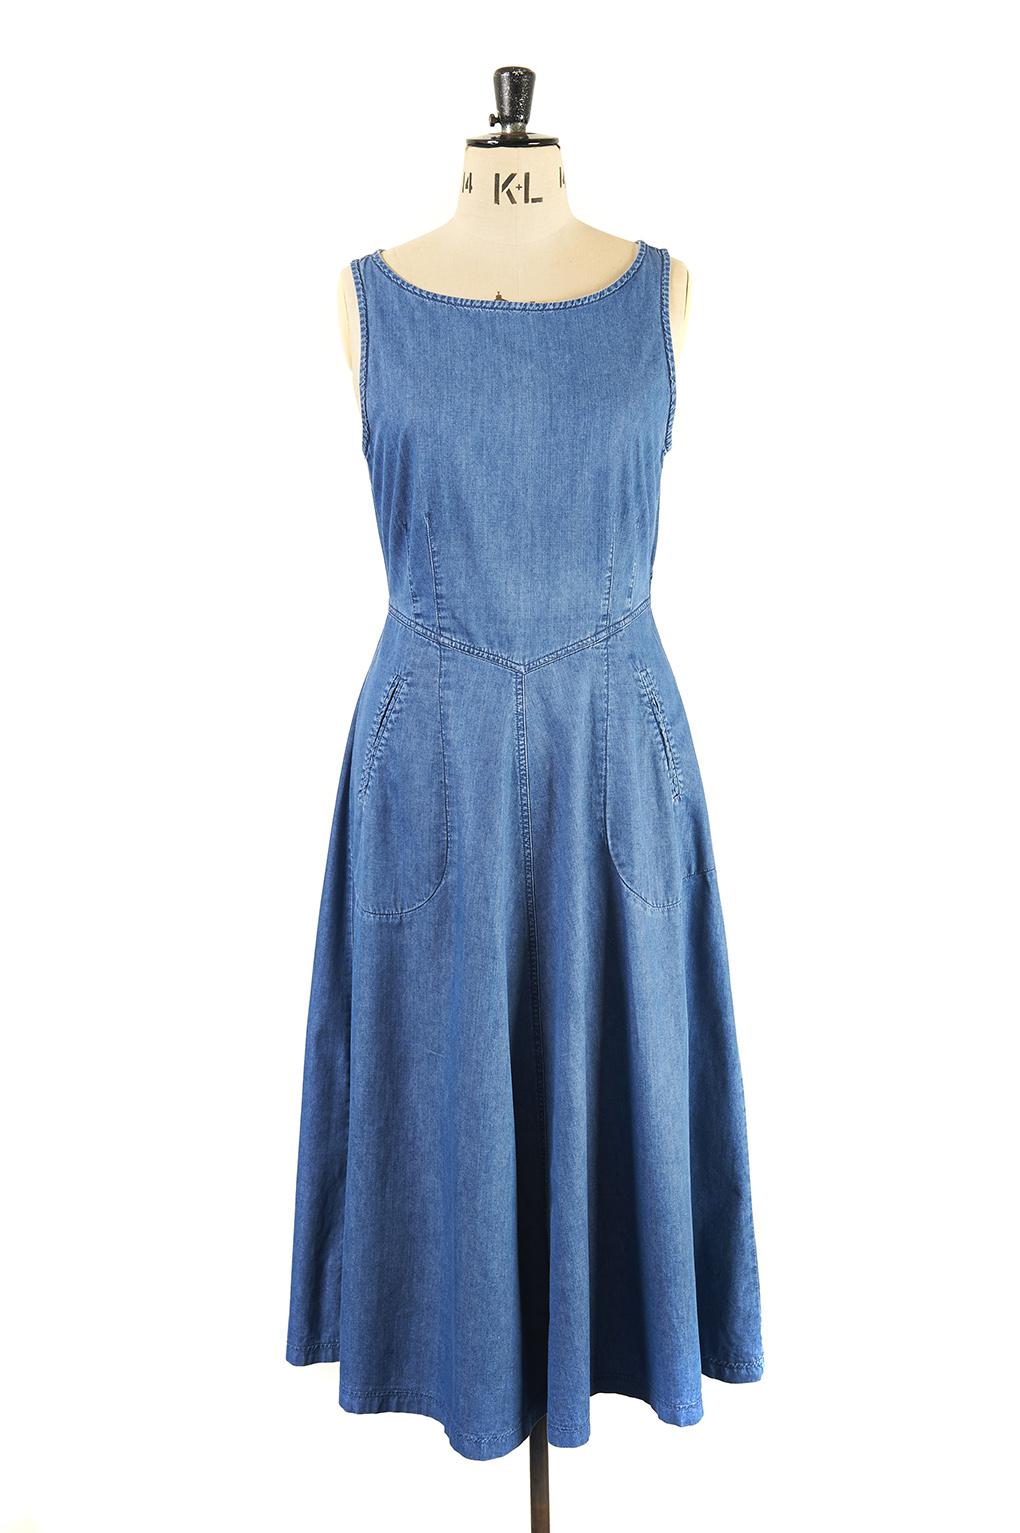 vintage Laura Ashley Denim Day Dress